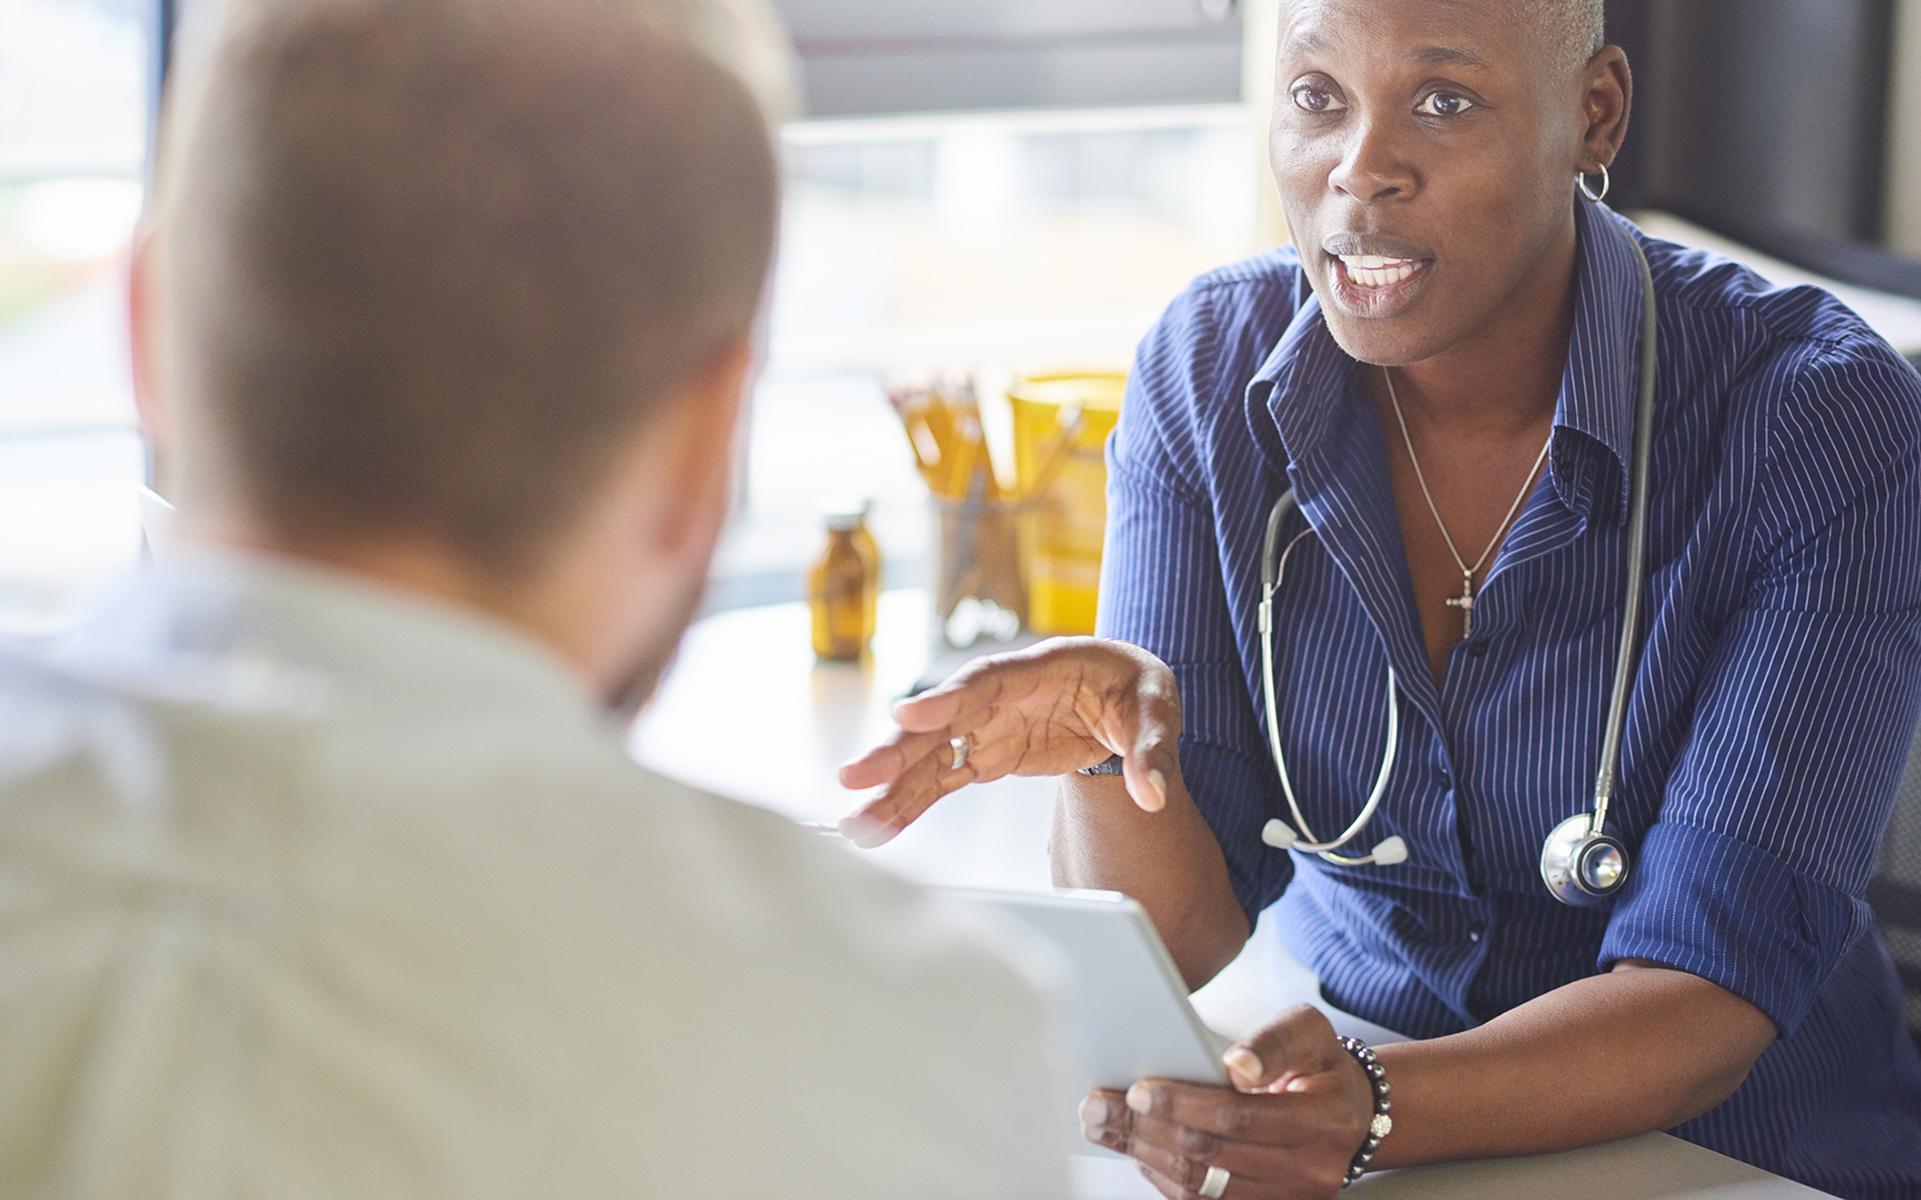 medical cannabis card doctor consultation